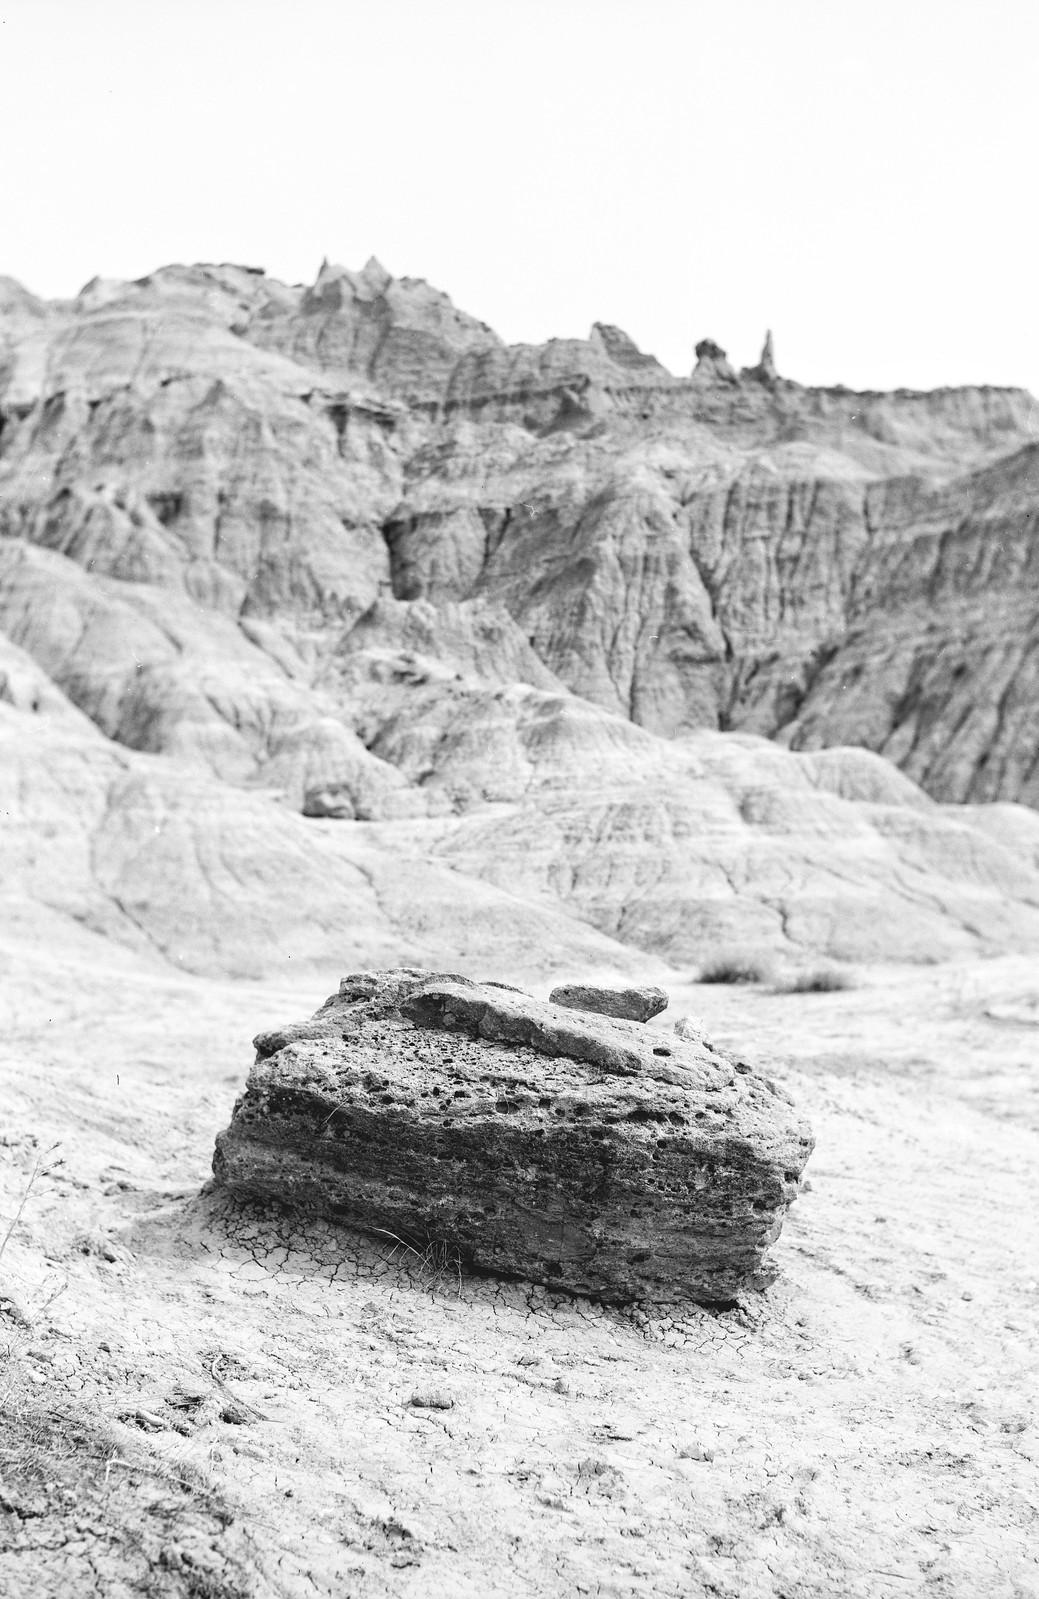 Badlands National Park - Horseman 985 / Kodak Tmax 100